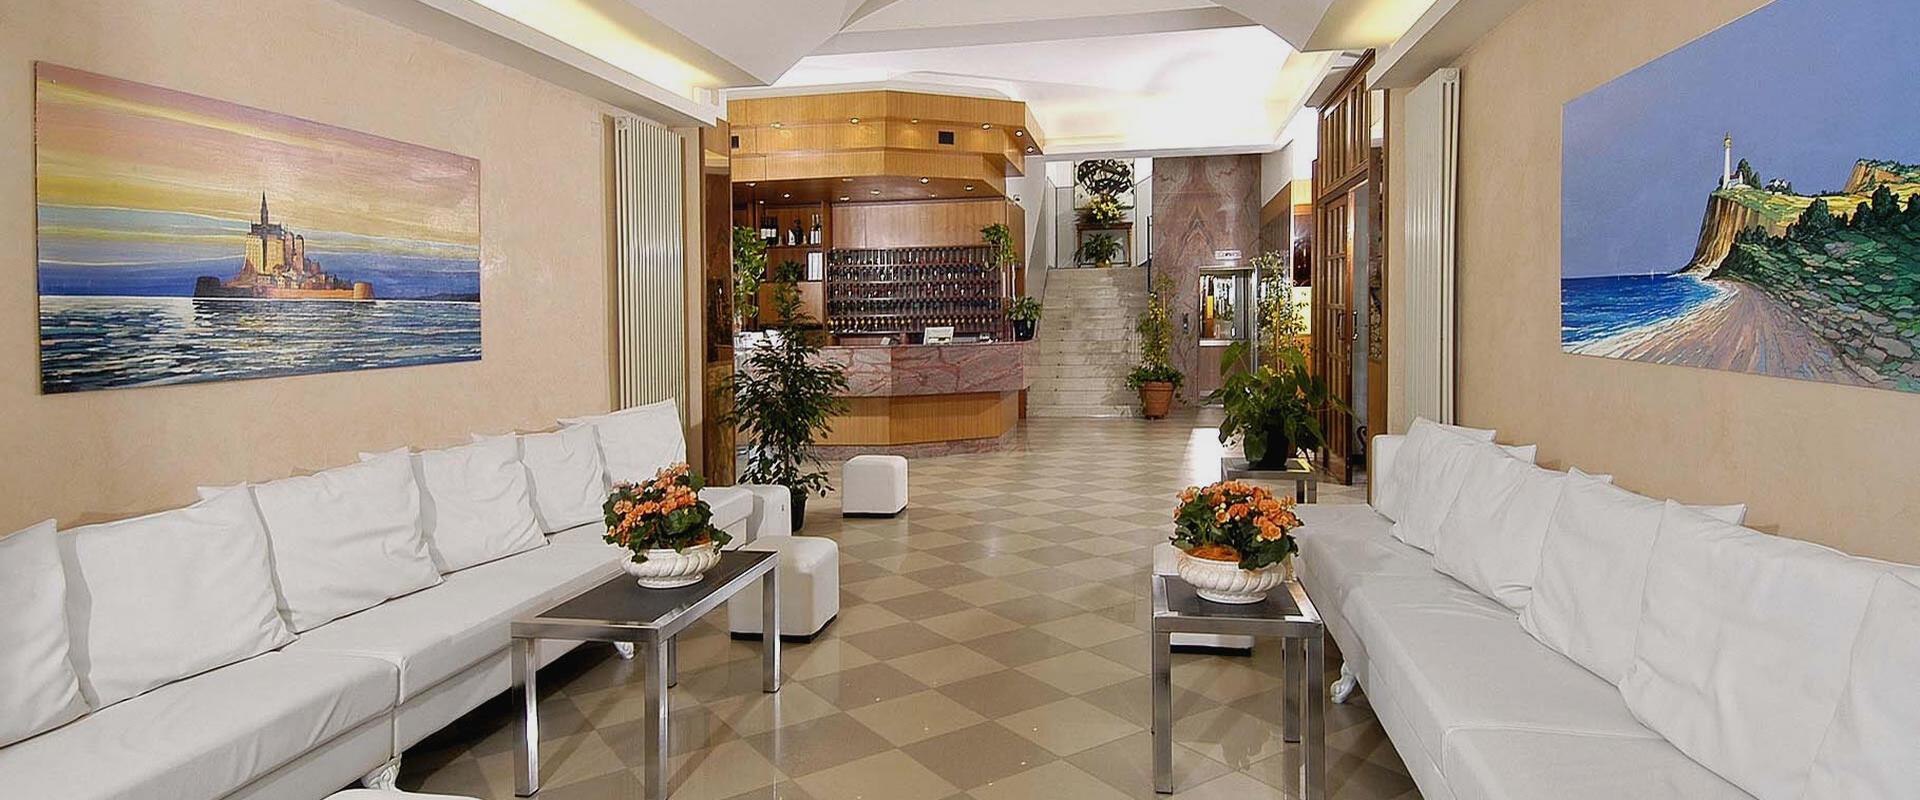 lungomarehotel it gallery 001